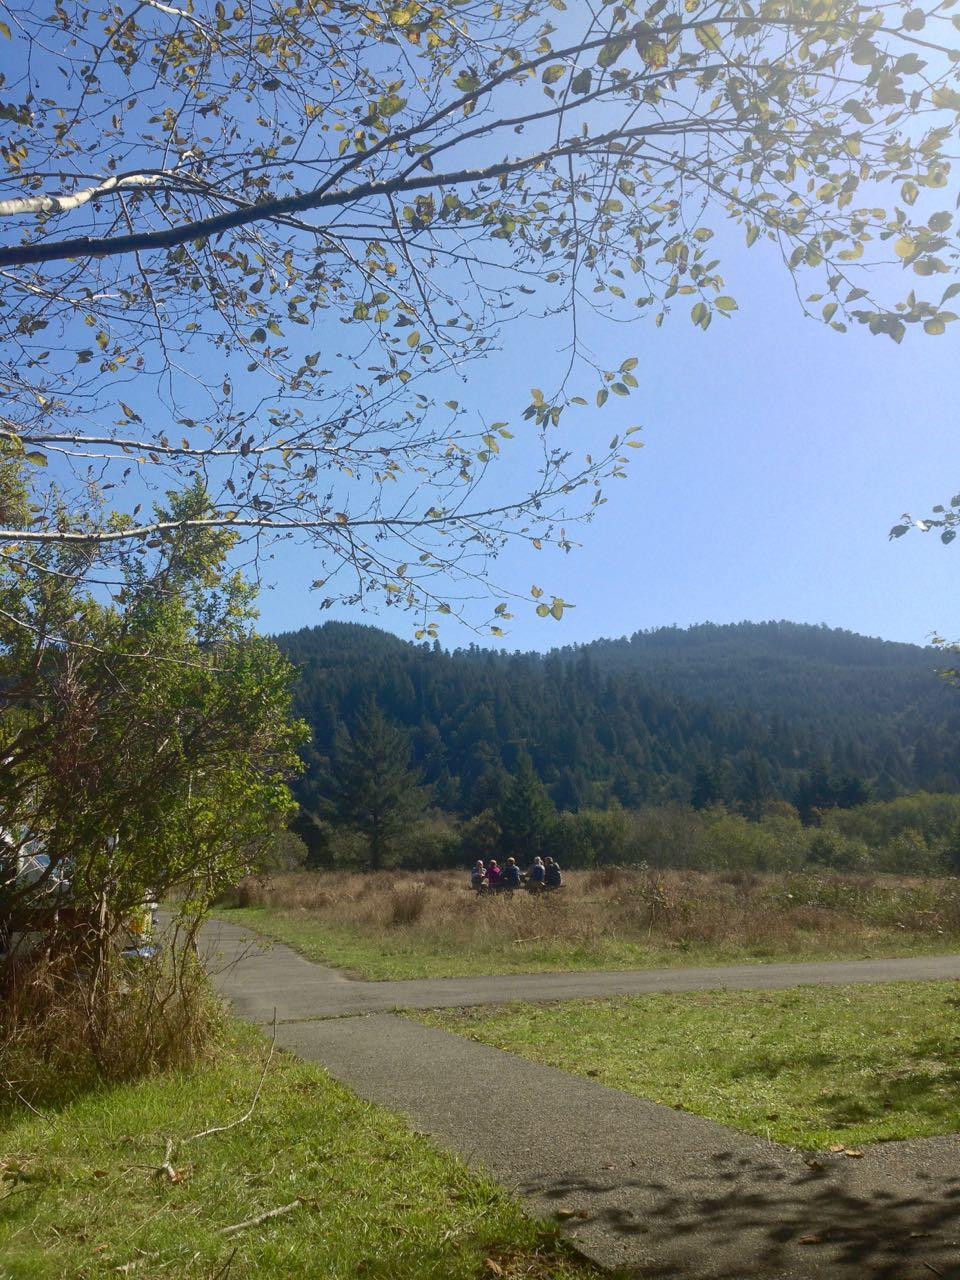 Redwoods 2017 10 08 258 Of 287